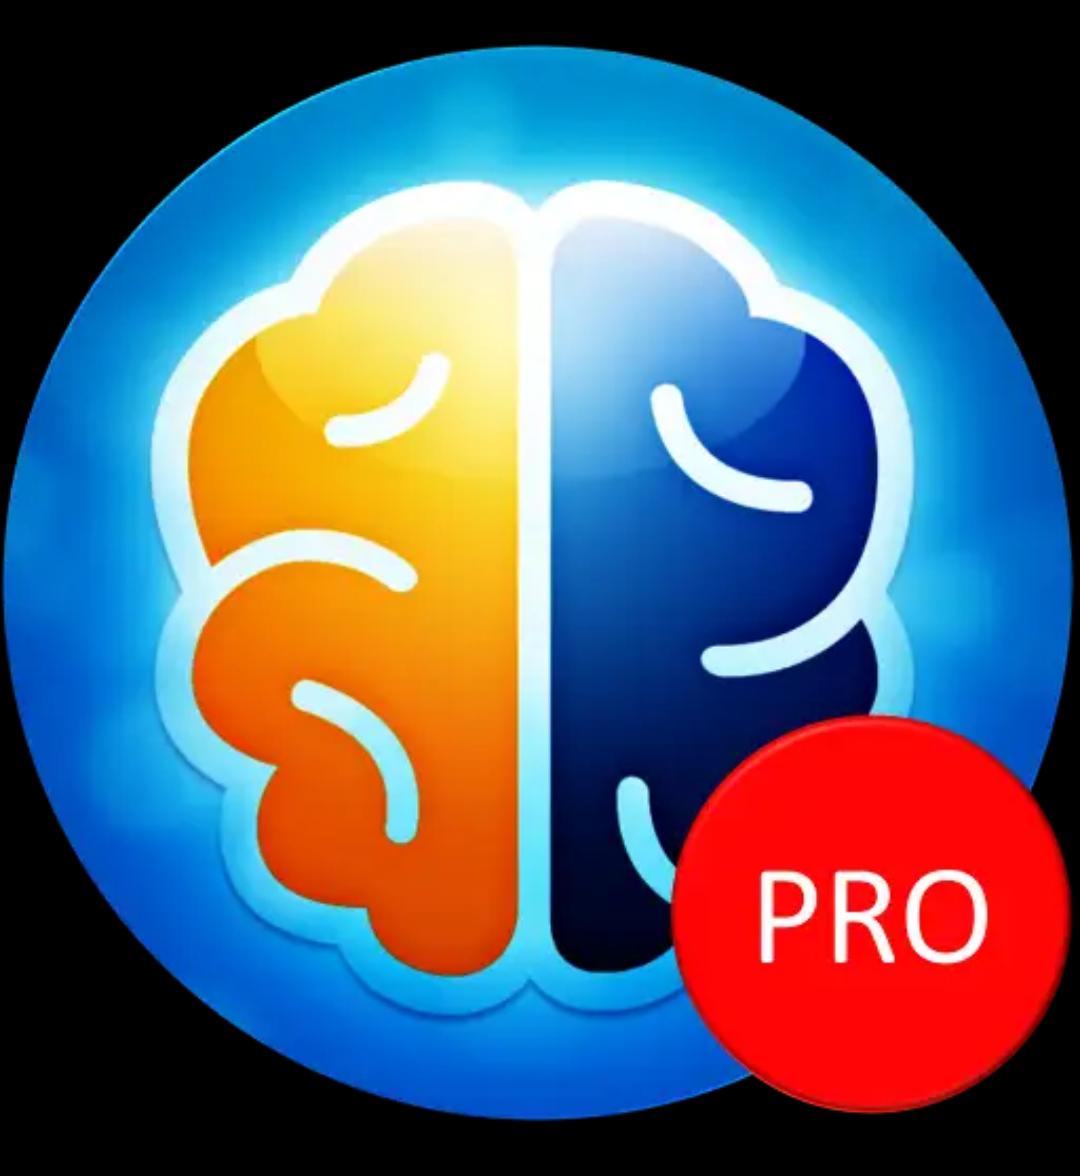 Denkspiele Pro - Mind Games Pro (4,6* >500.000 Downloads) [Android-Freebie]